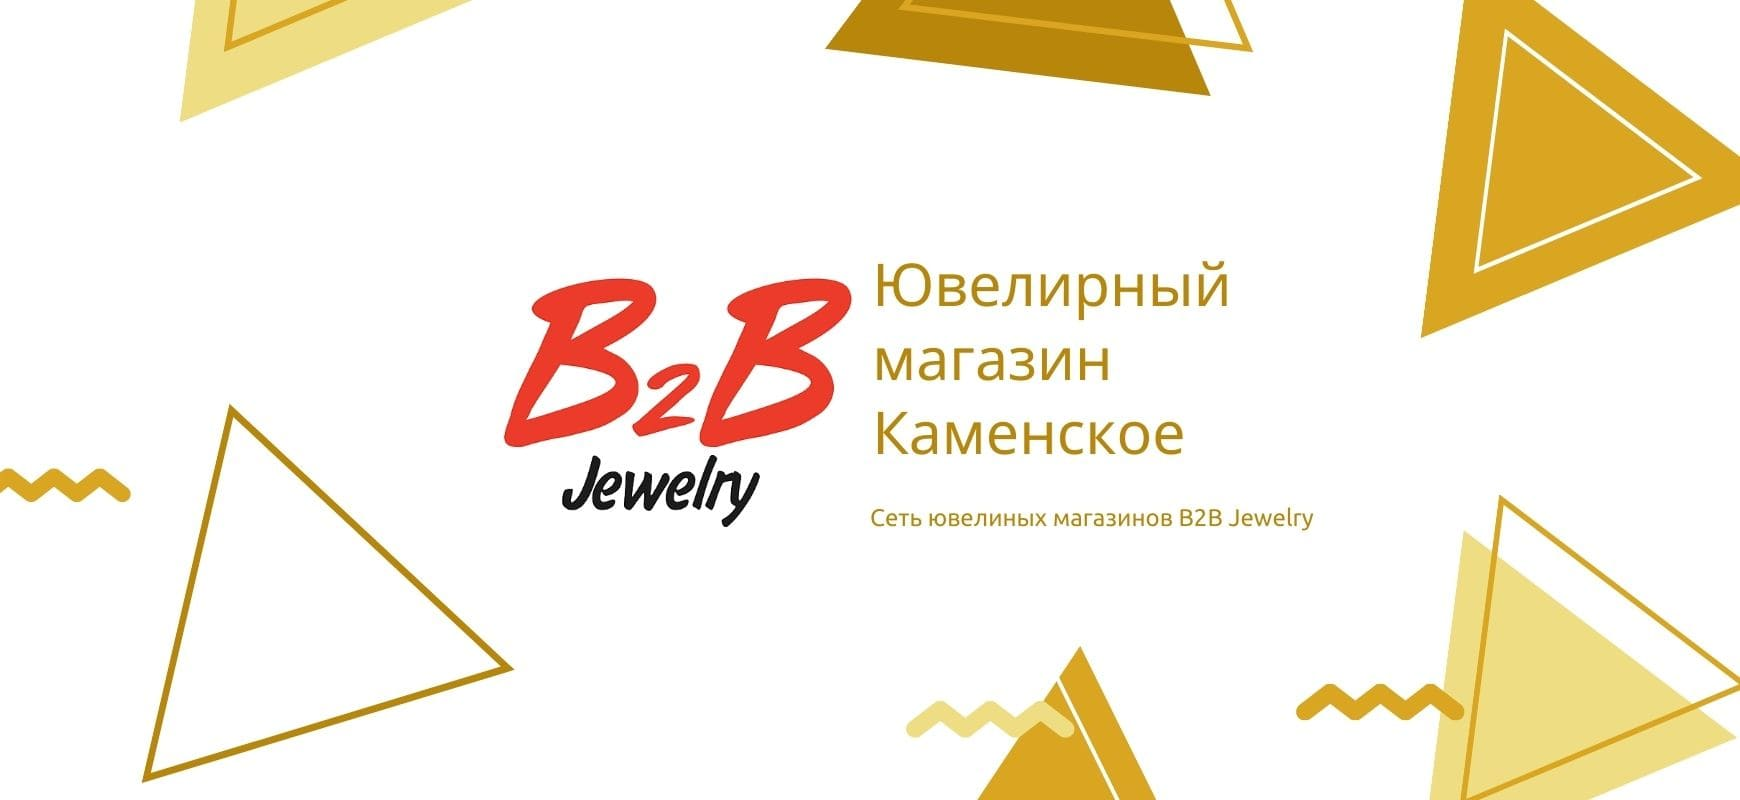 B2B JEWELRY КАМЕНСКОЕ